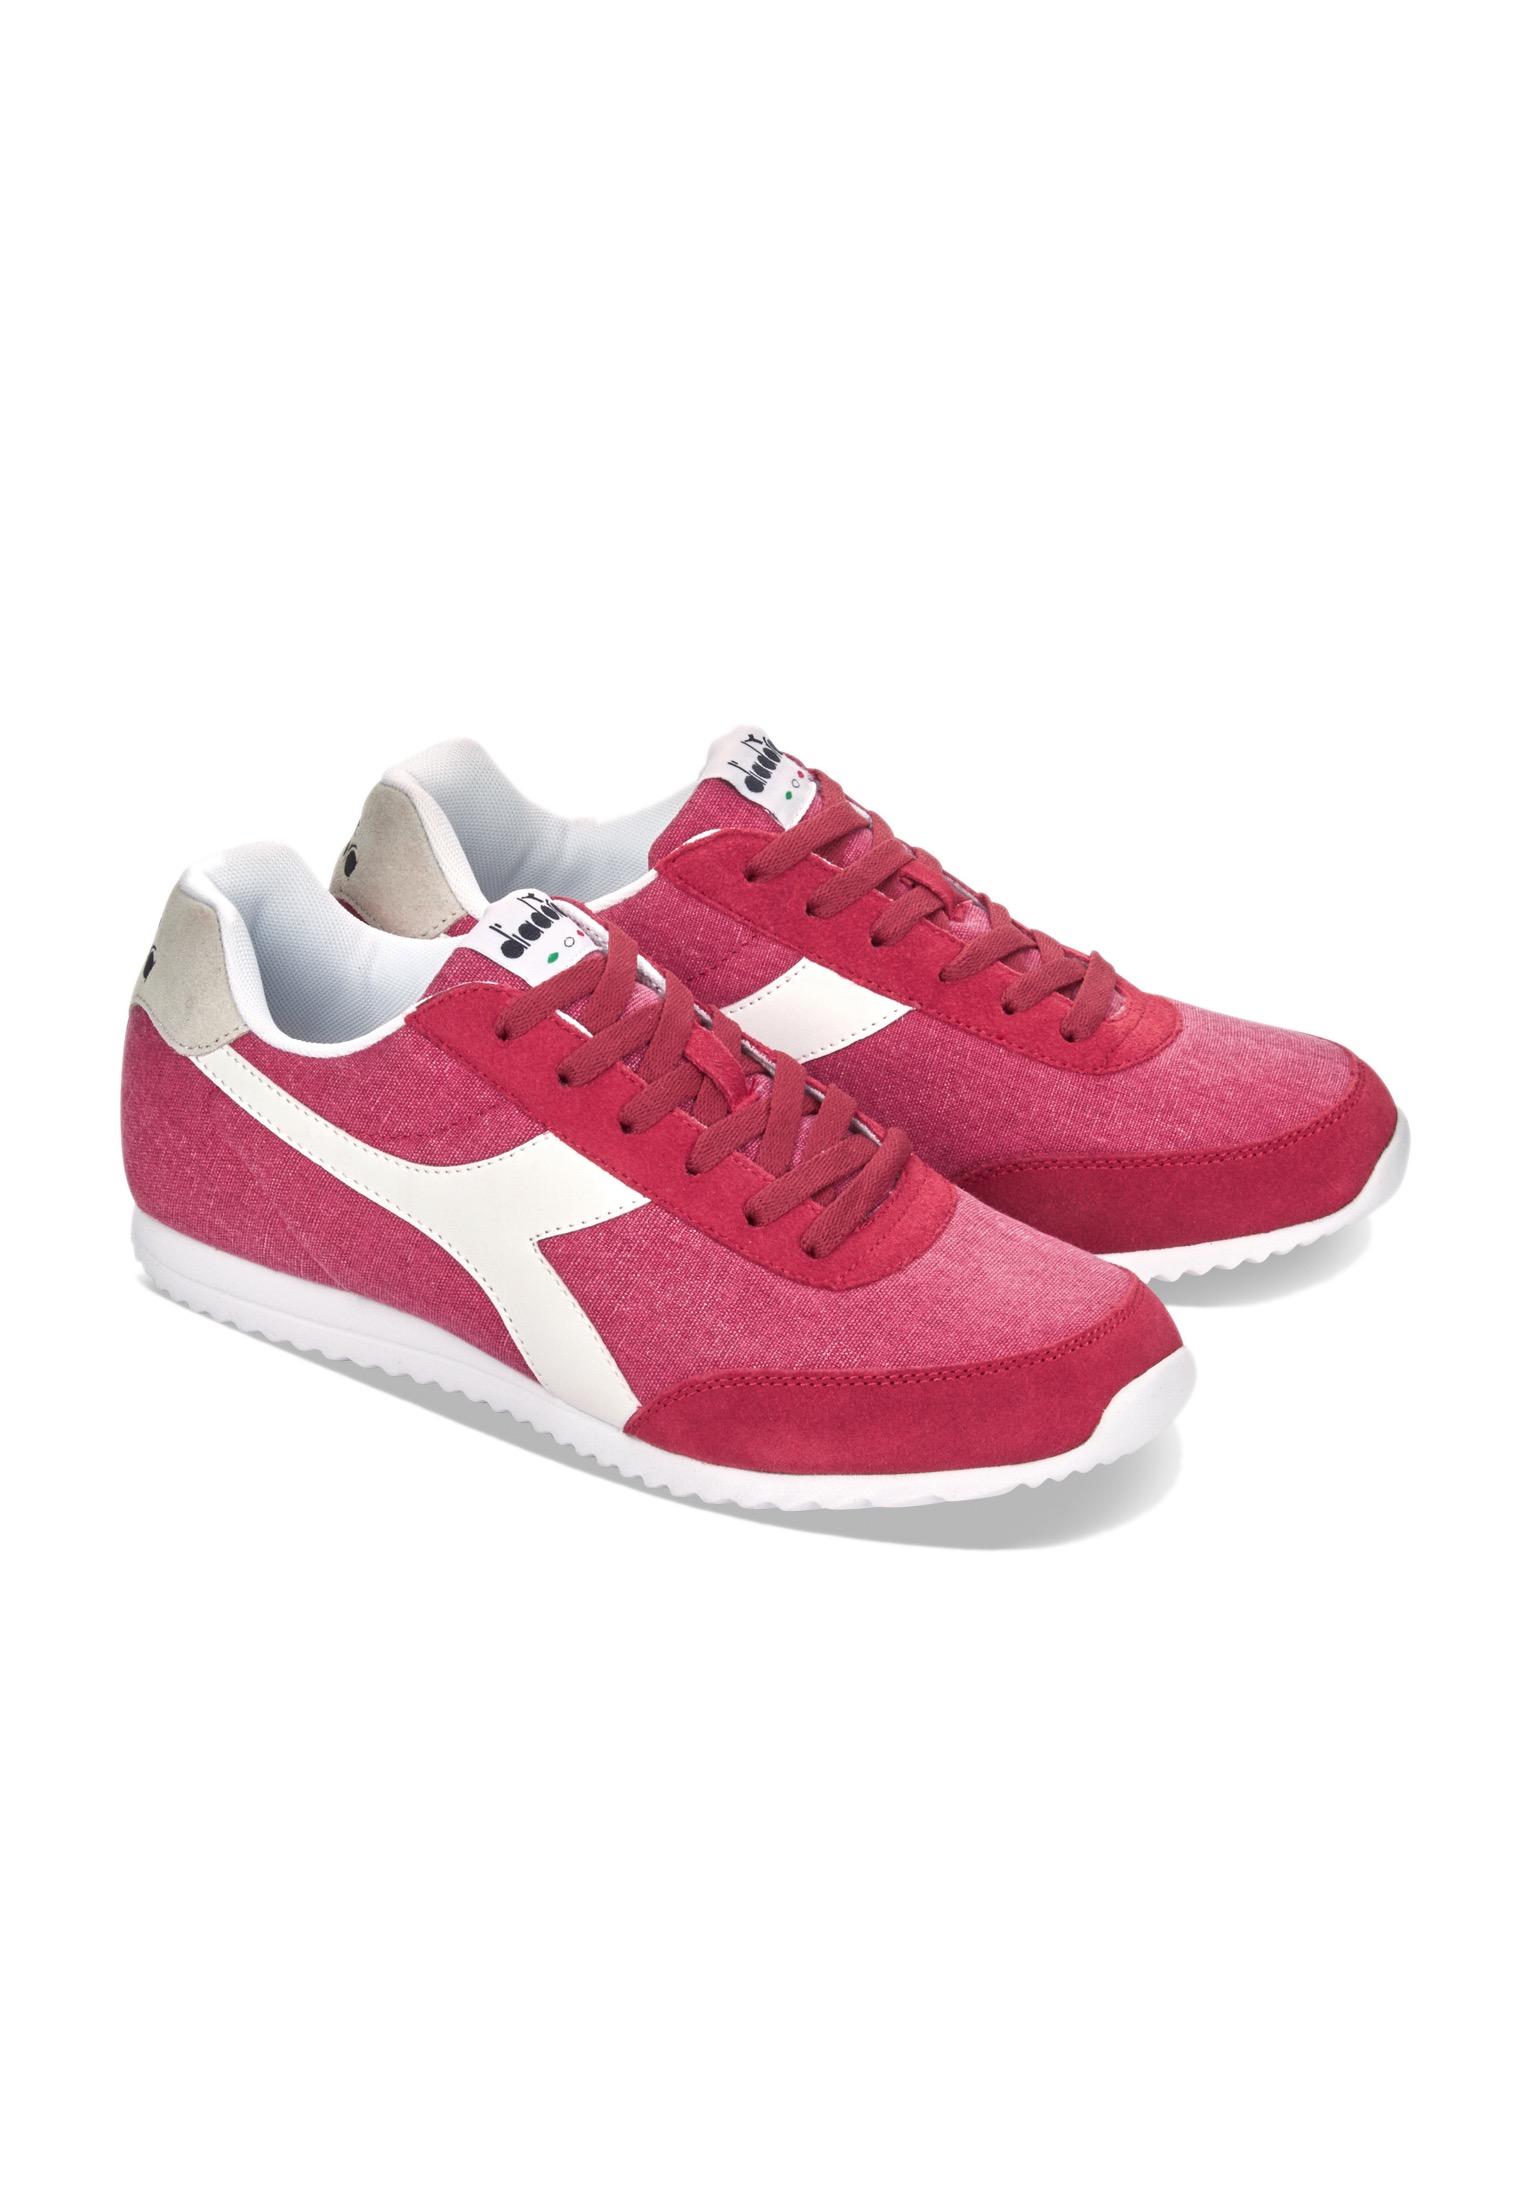 Scarpe-Diadora-Jog-Light-C-Sneakers-sportive-uomo-donna-vari-colori-e-taglie miniatura 5